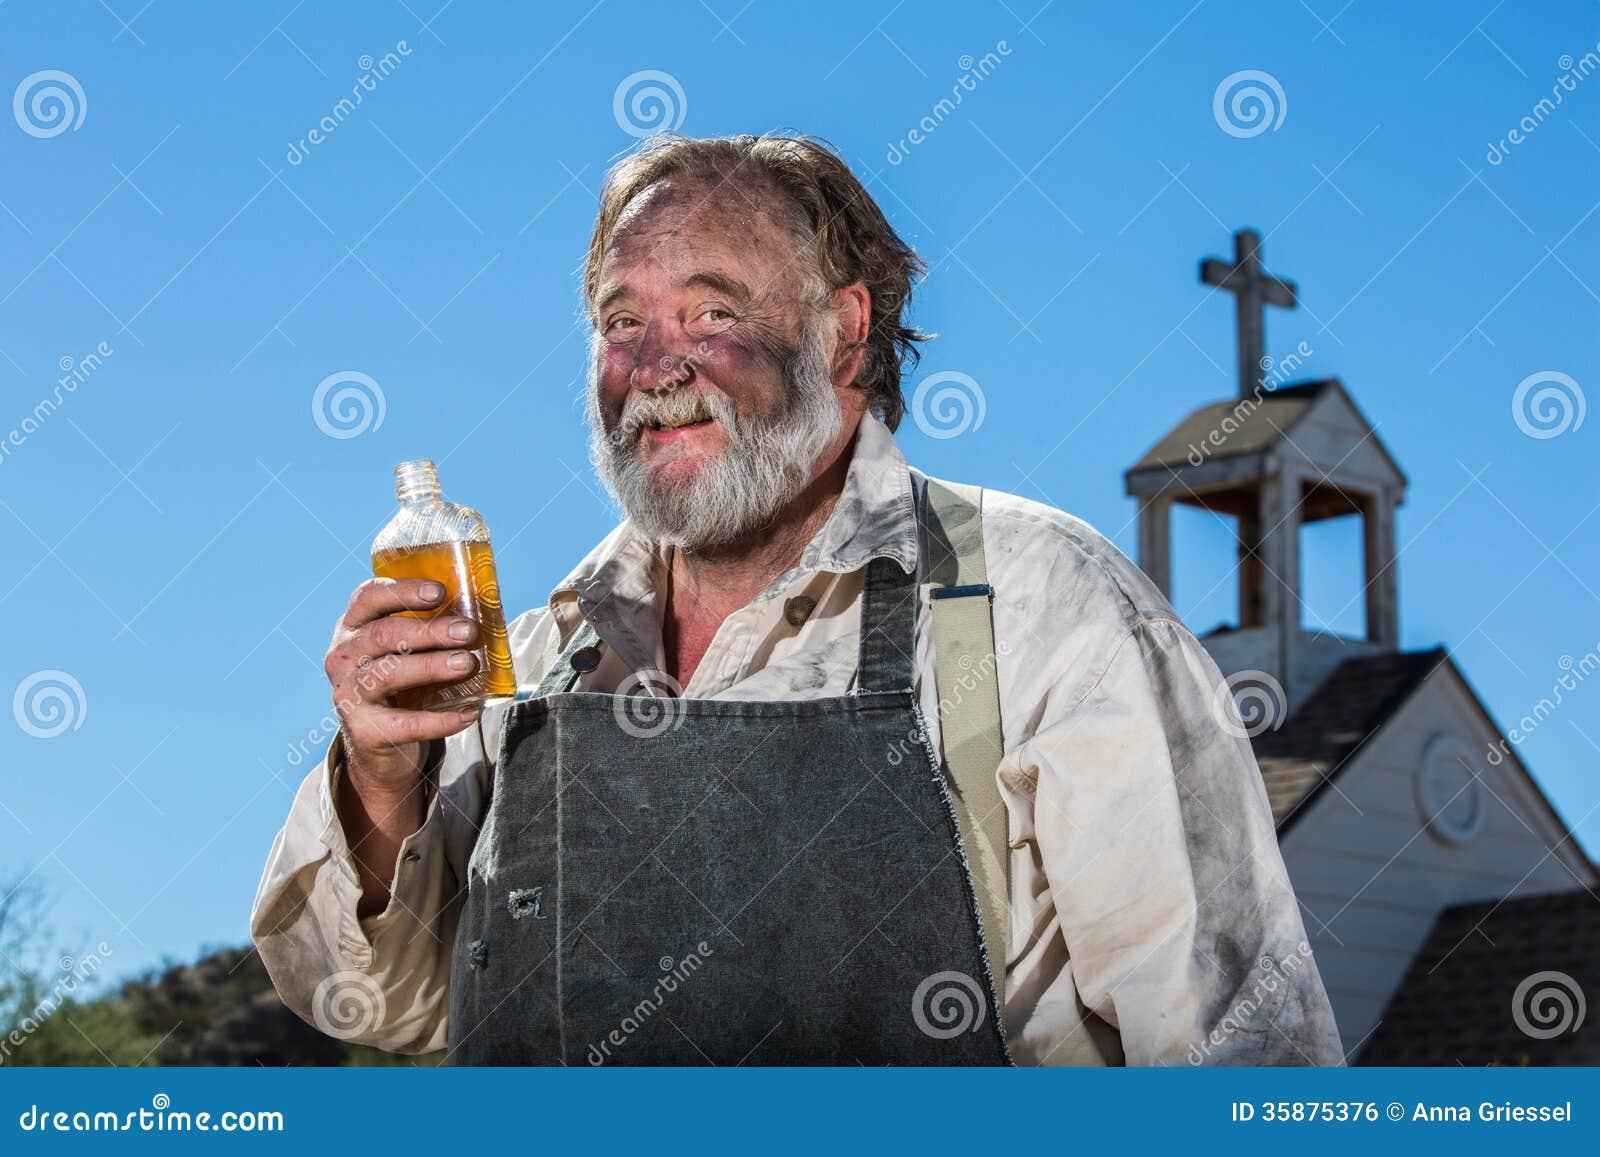 Hot or Not - Page 11 Old-west-drunkard-drinks-bottle-alchohol-35875376